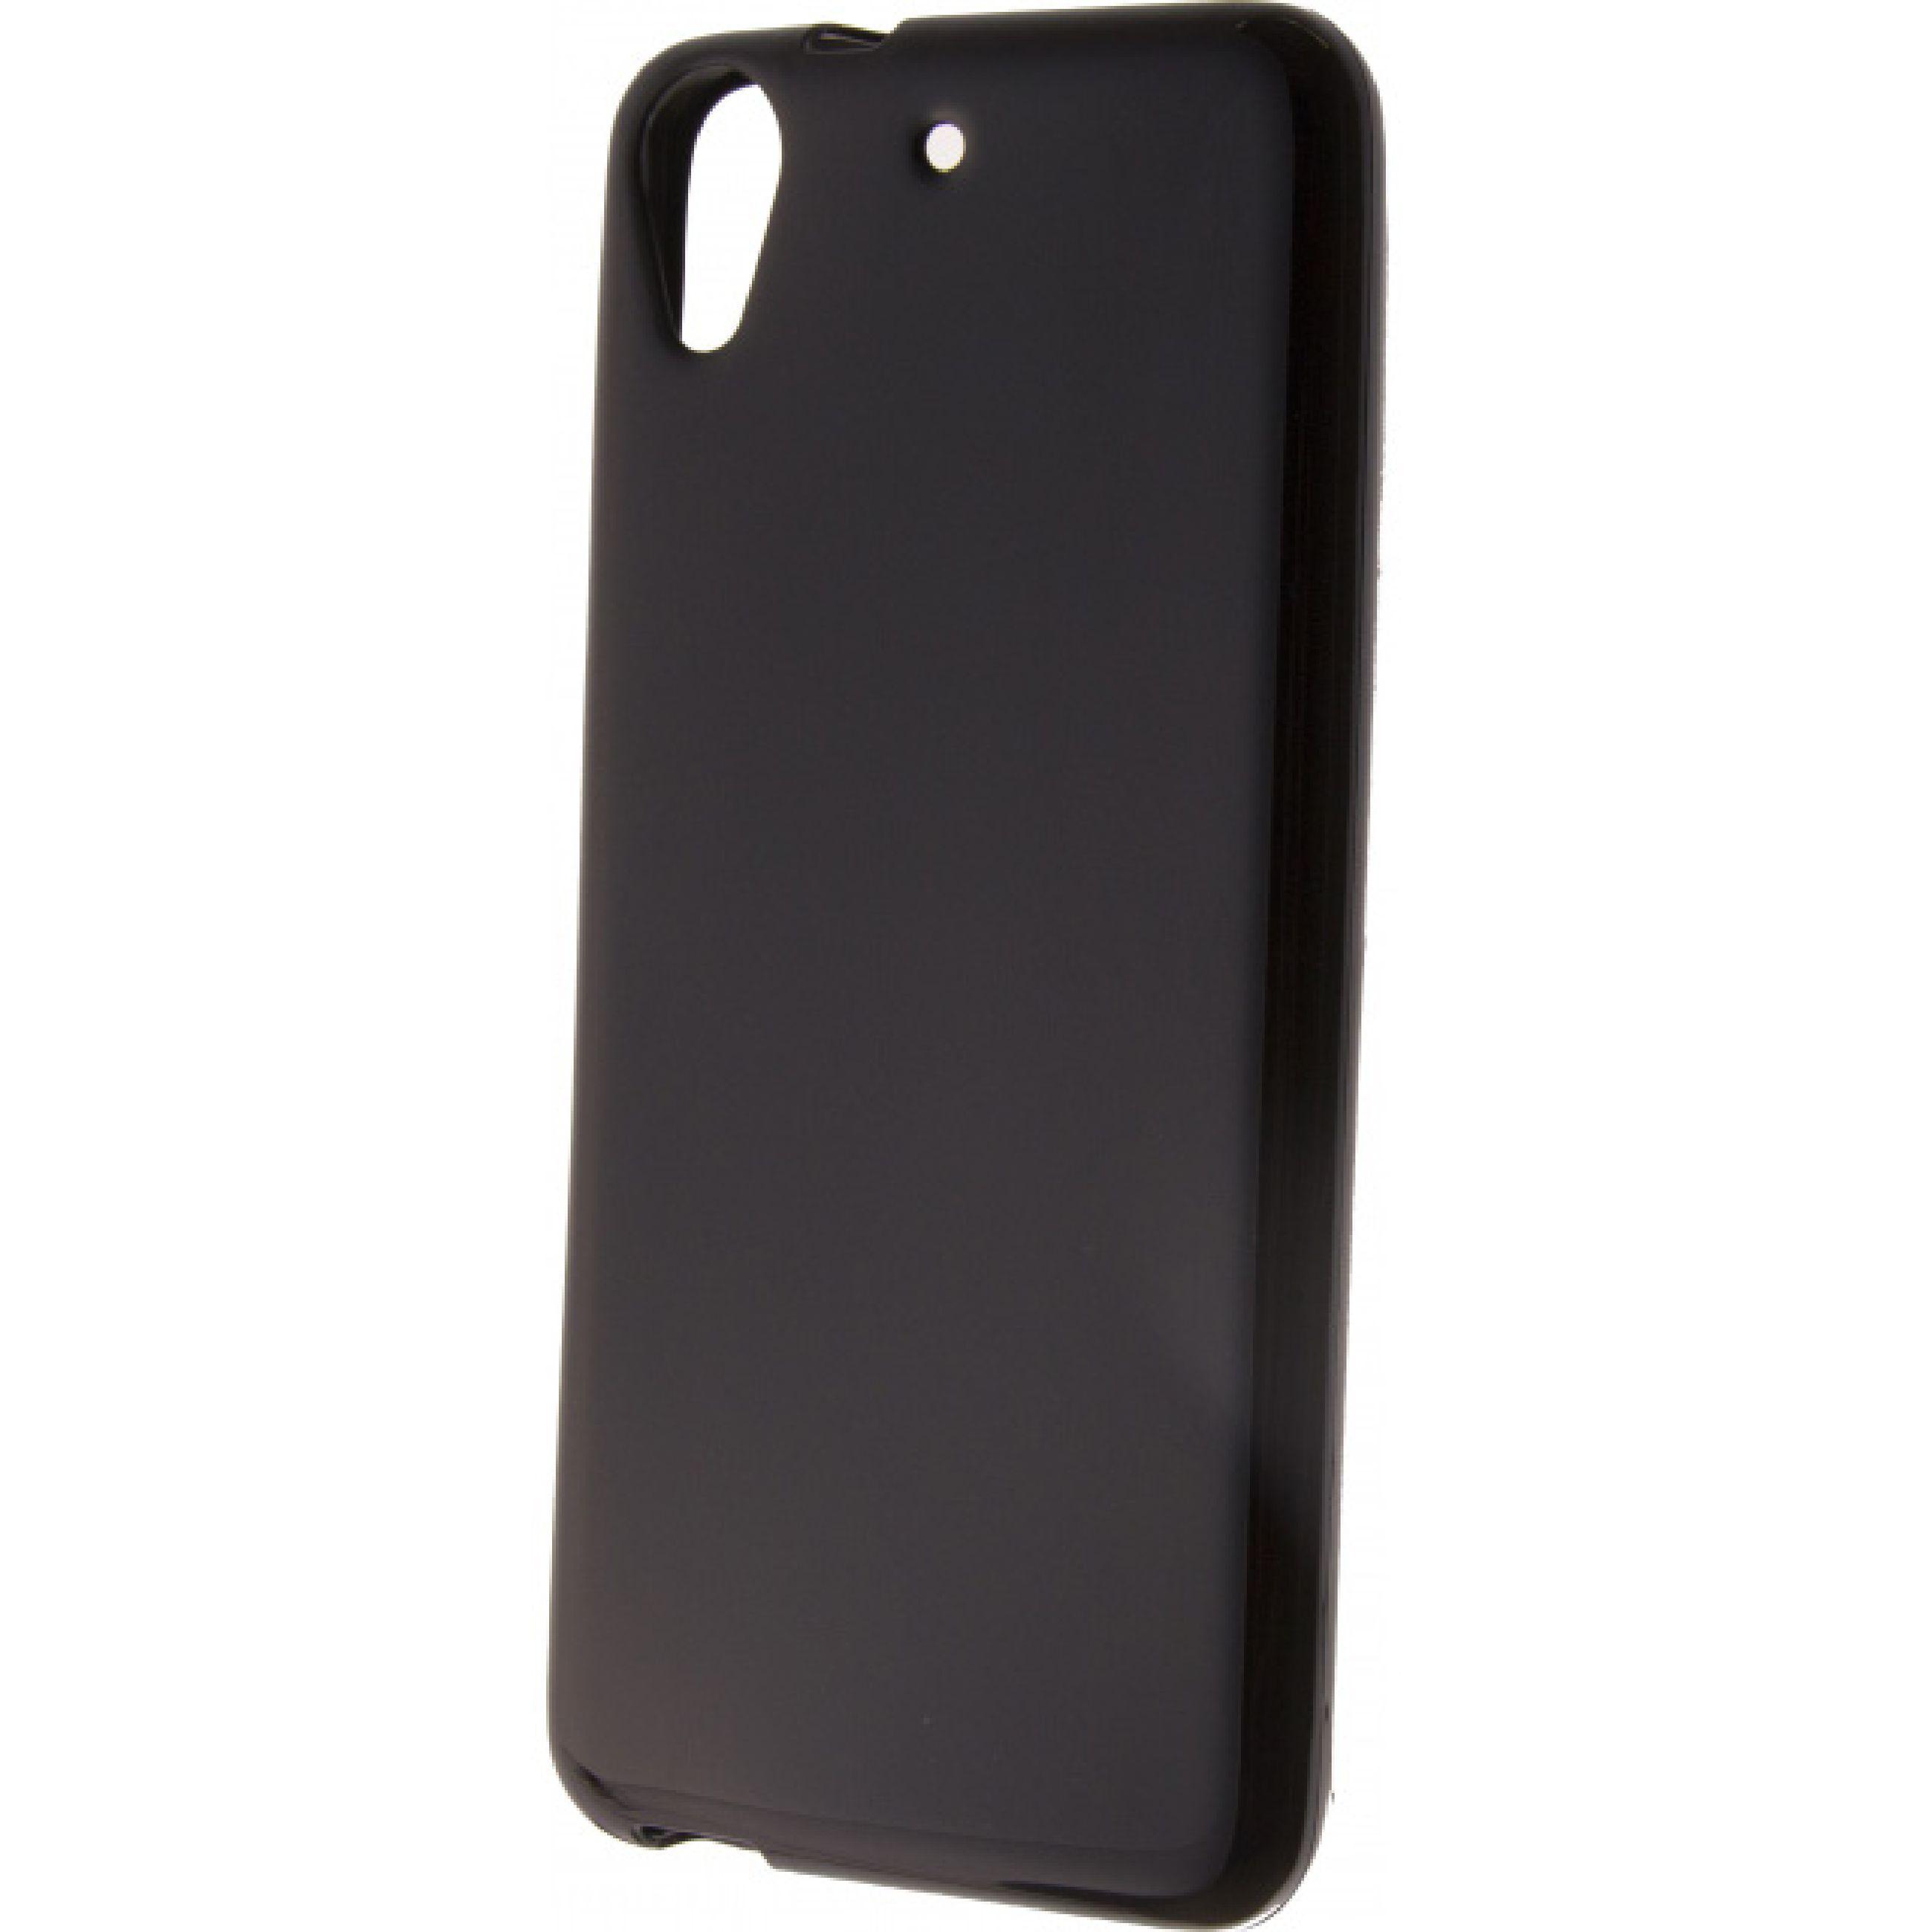 Image of   Telefon Gel-Etui HTC Desire 650 Sort